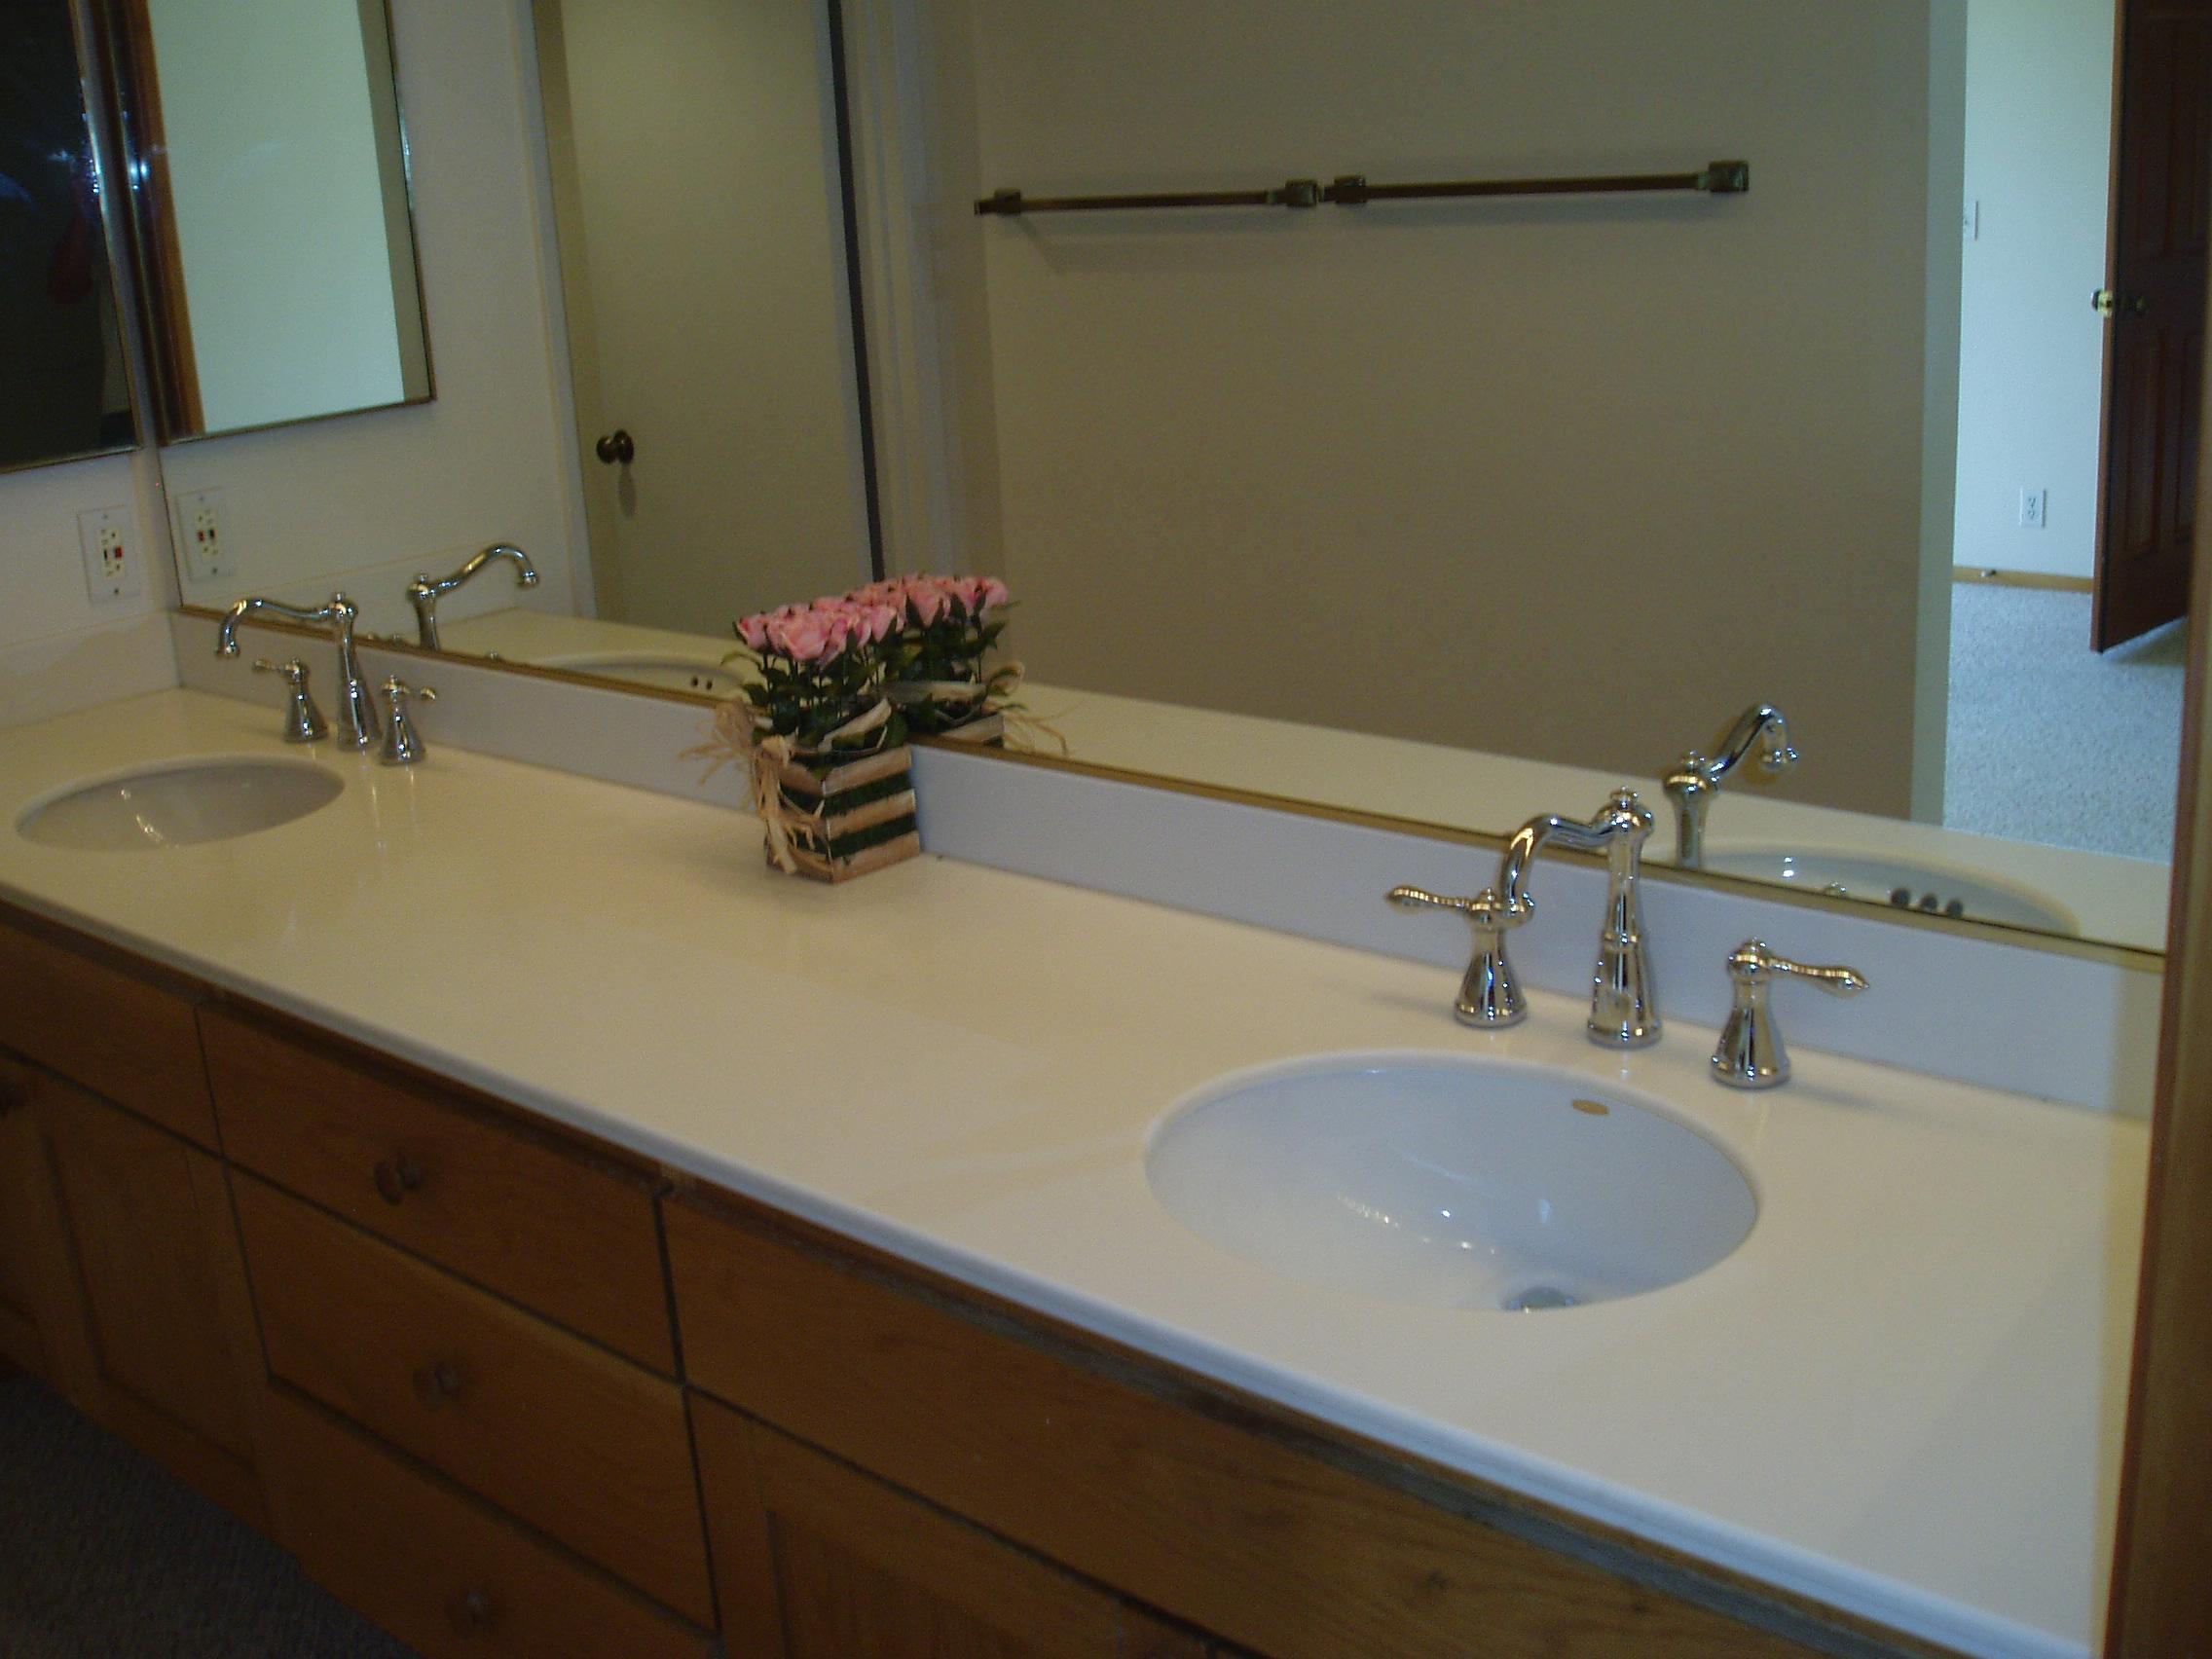 a change bathtubs pedestal elegant contemporary faucet kitchen remove how bathtub sink diy fascinating design install to bathroom replacing faucets u of